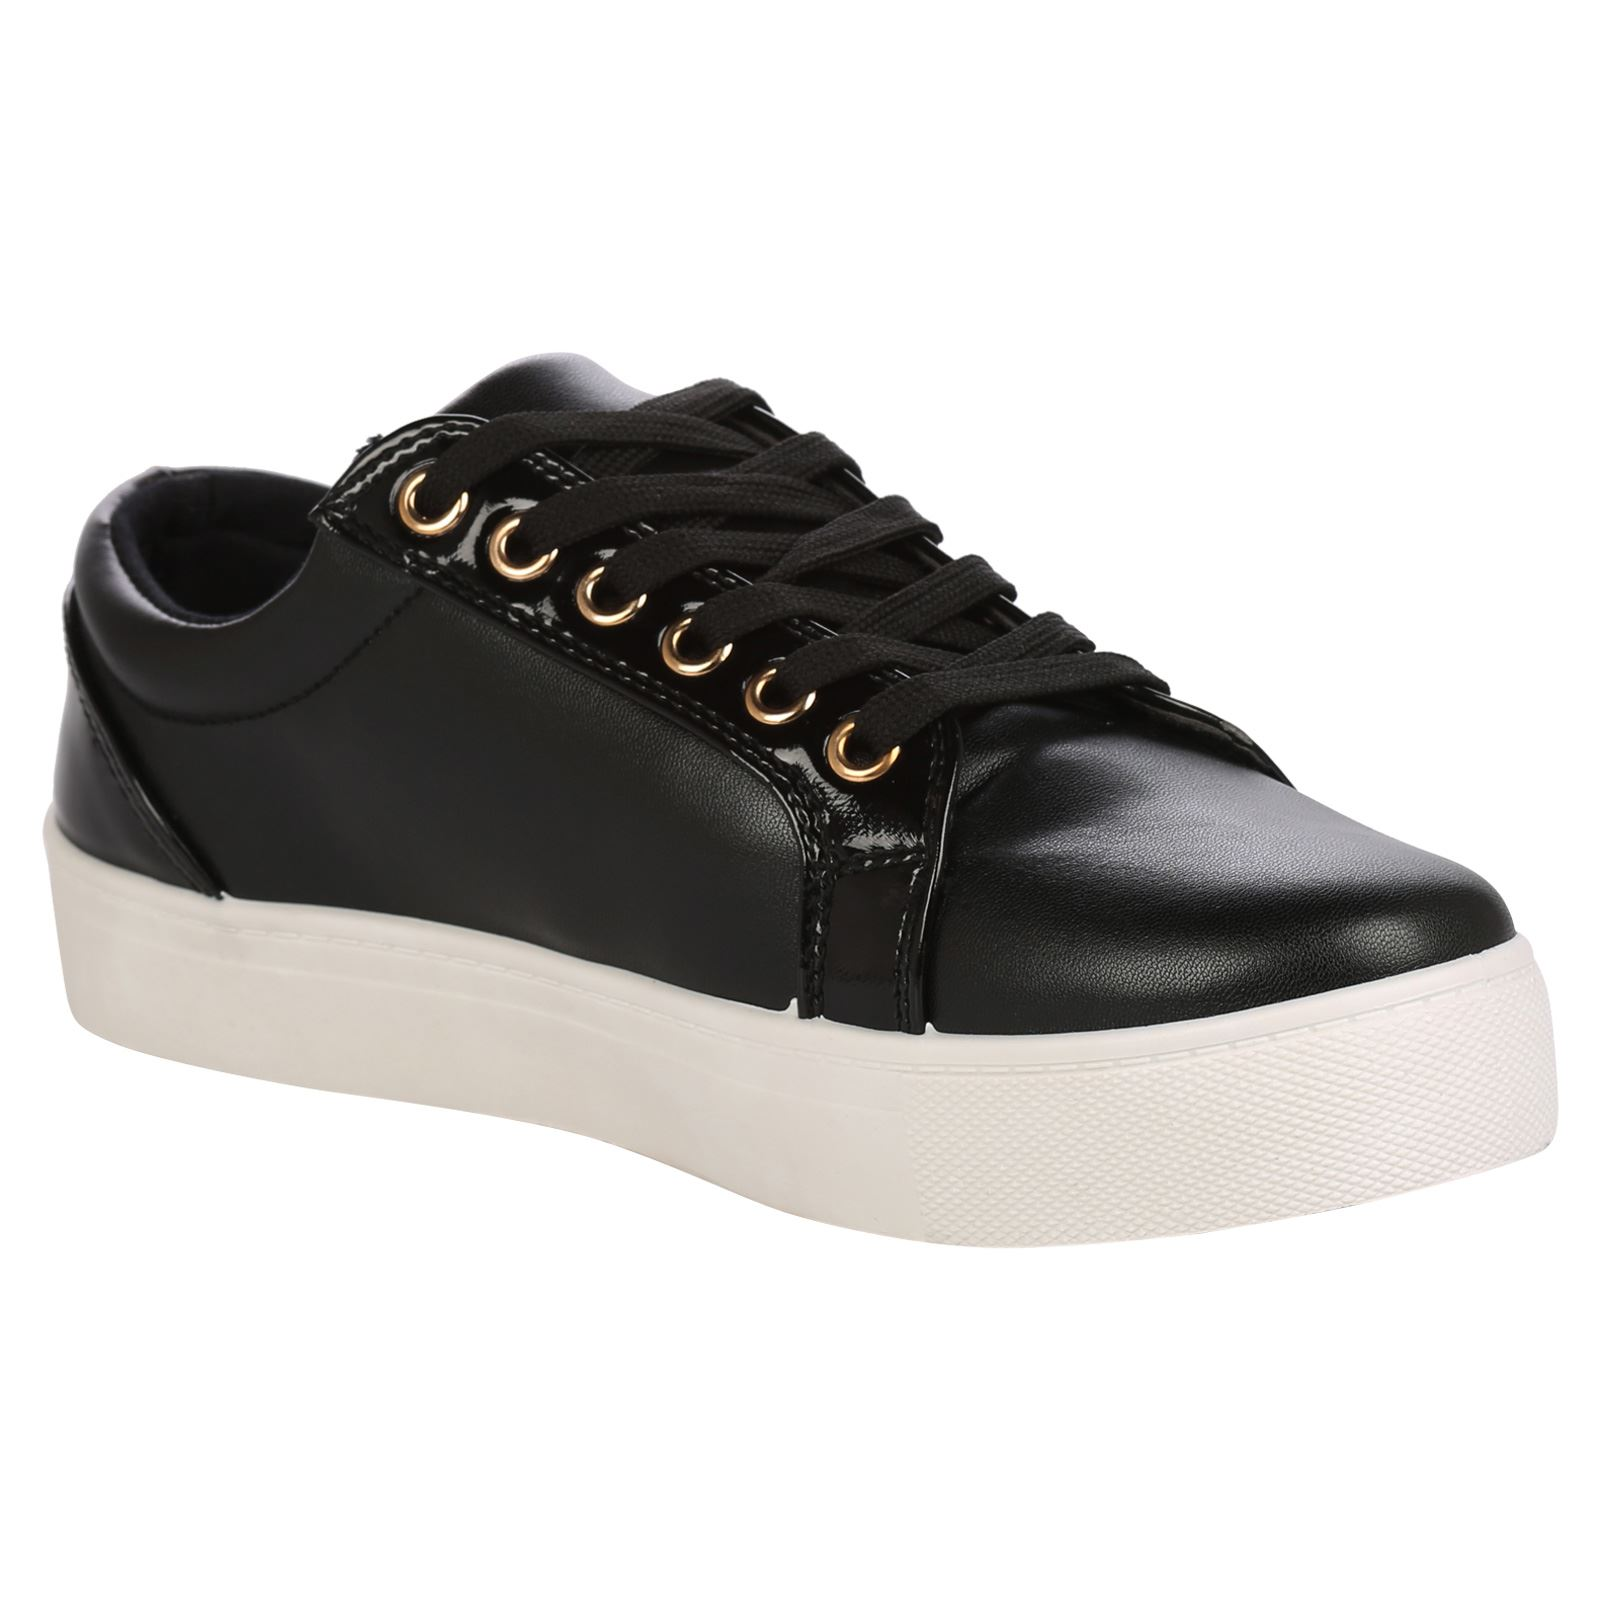 womens shoes ladies trainers pumps plimsolls lace up flats